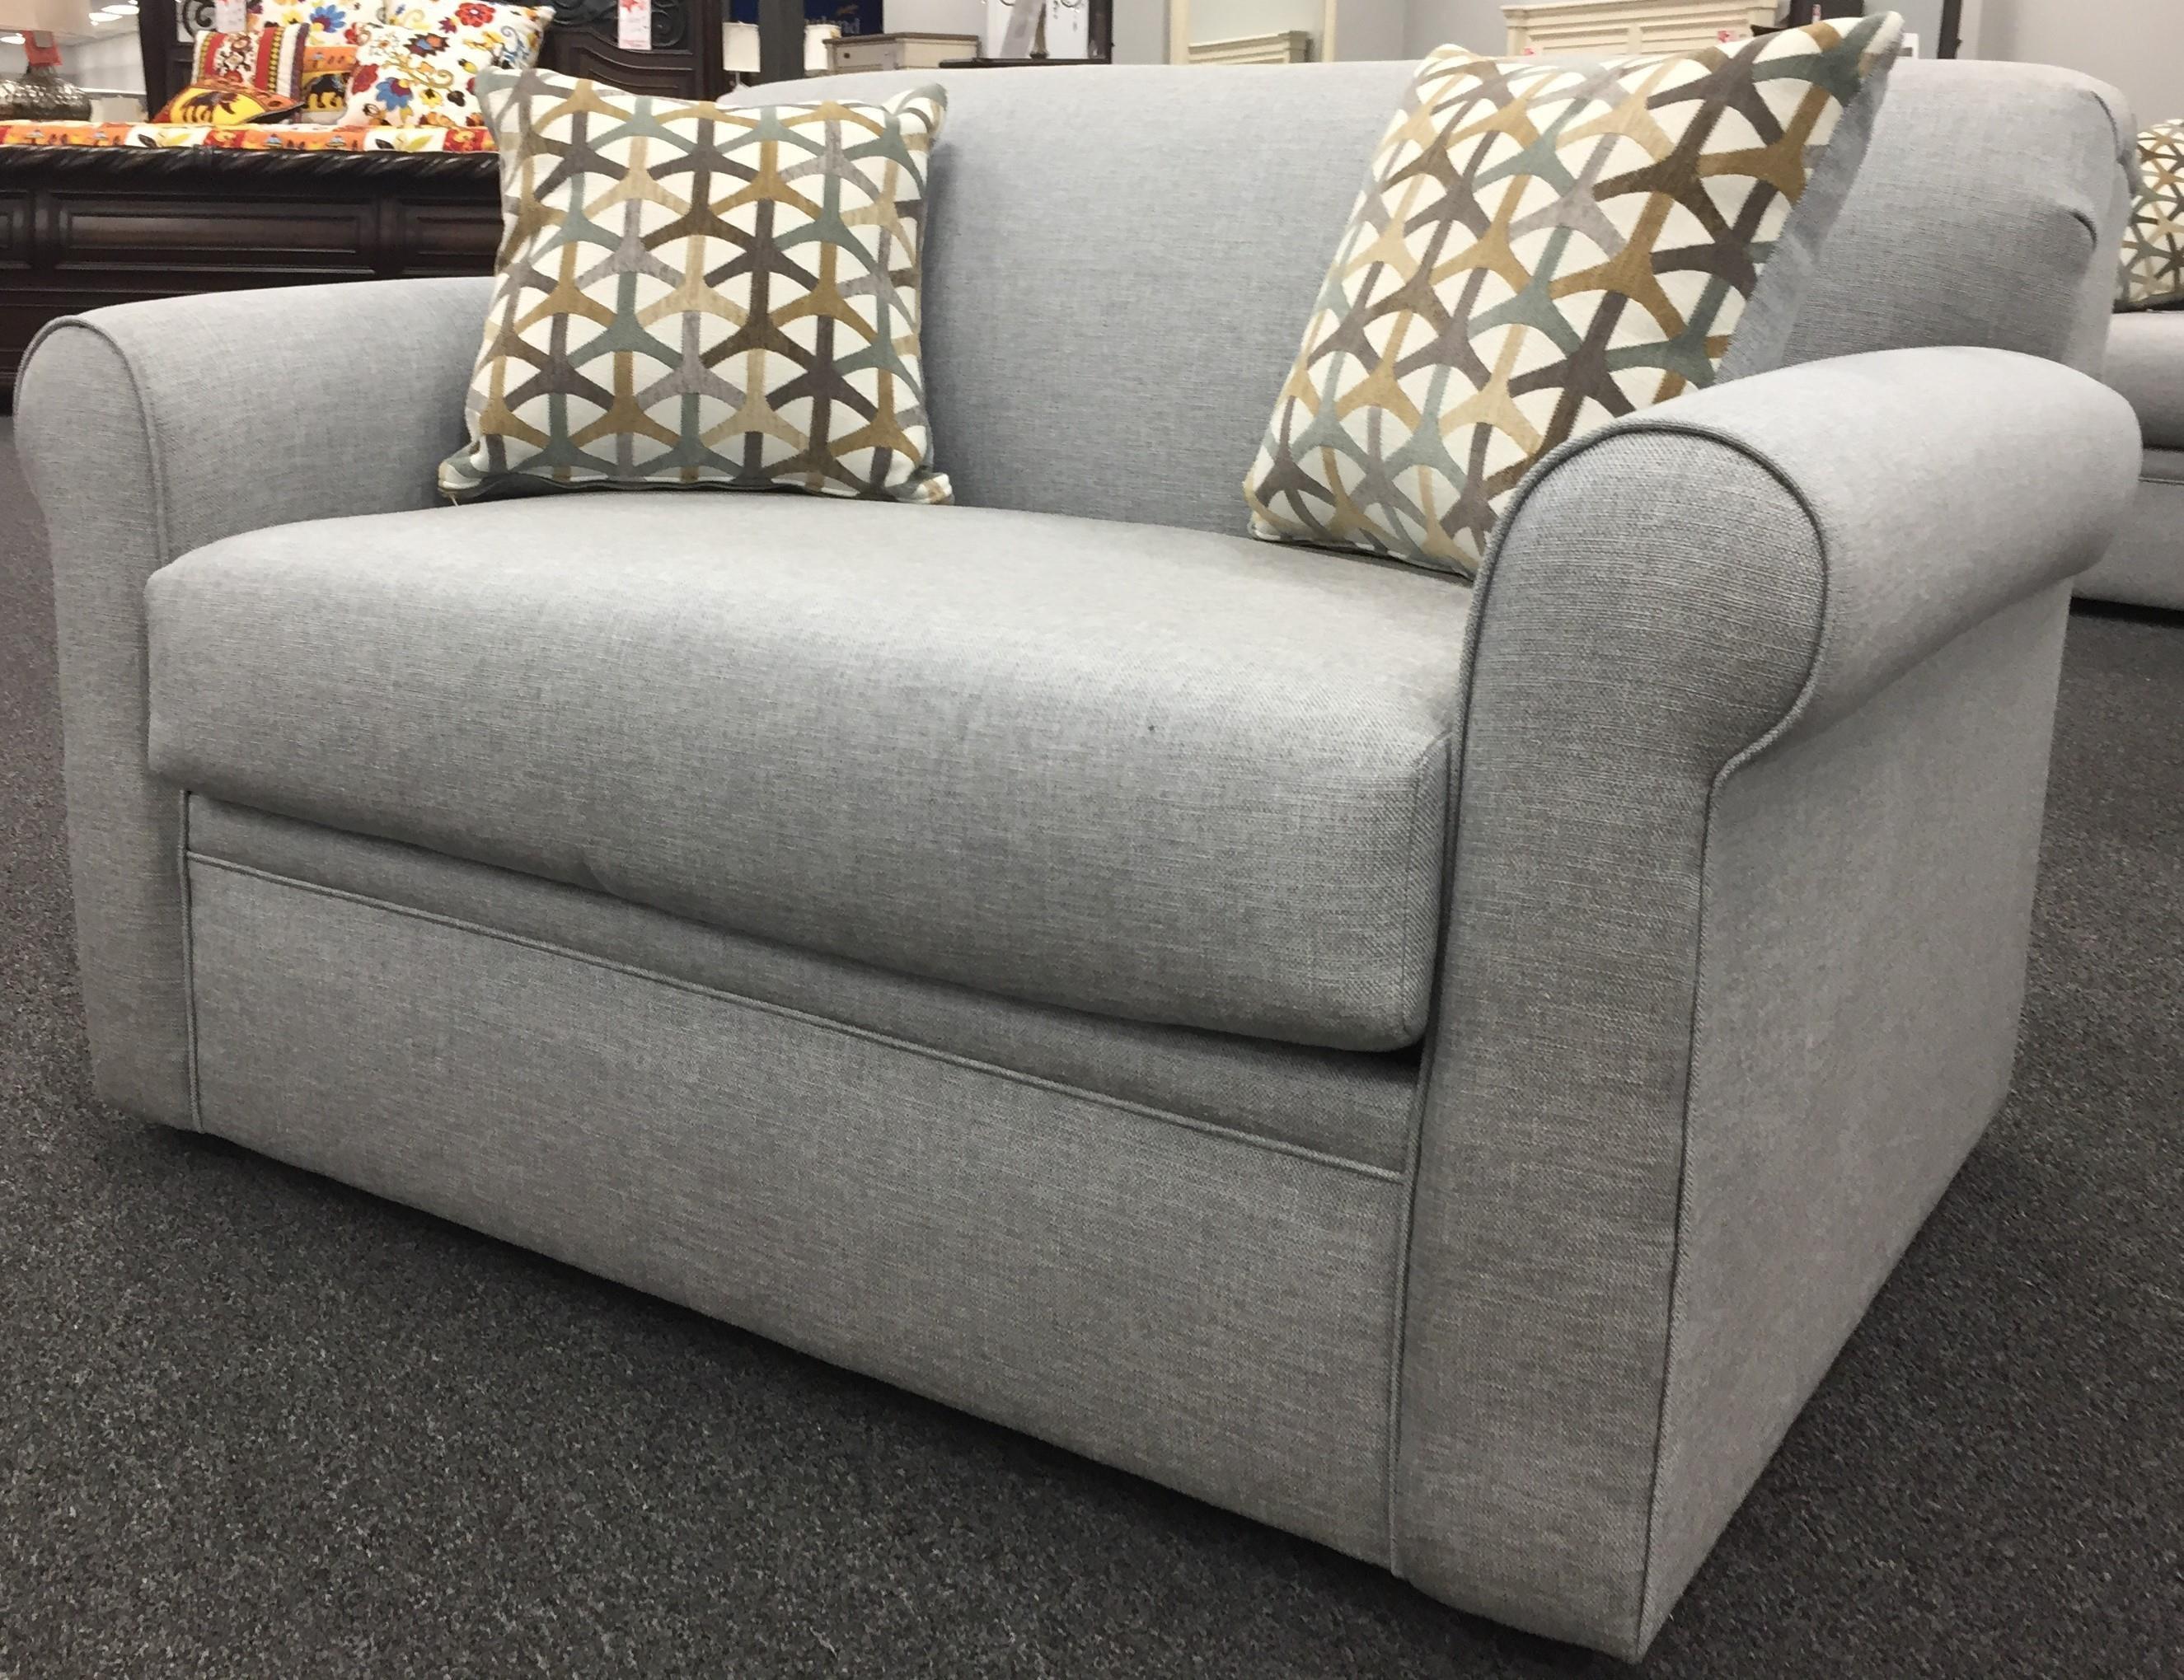 2300 Twin Sleeper Sofa by Overnight Sofa at Furniture Fair - North Carolina